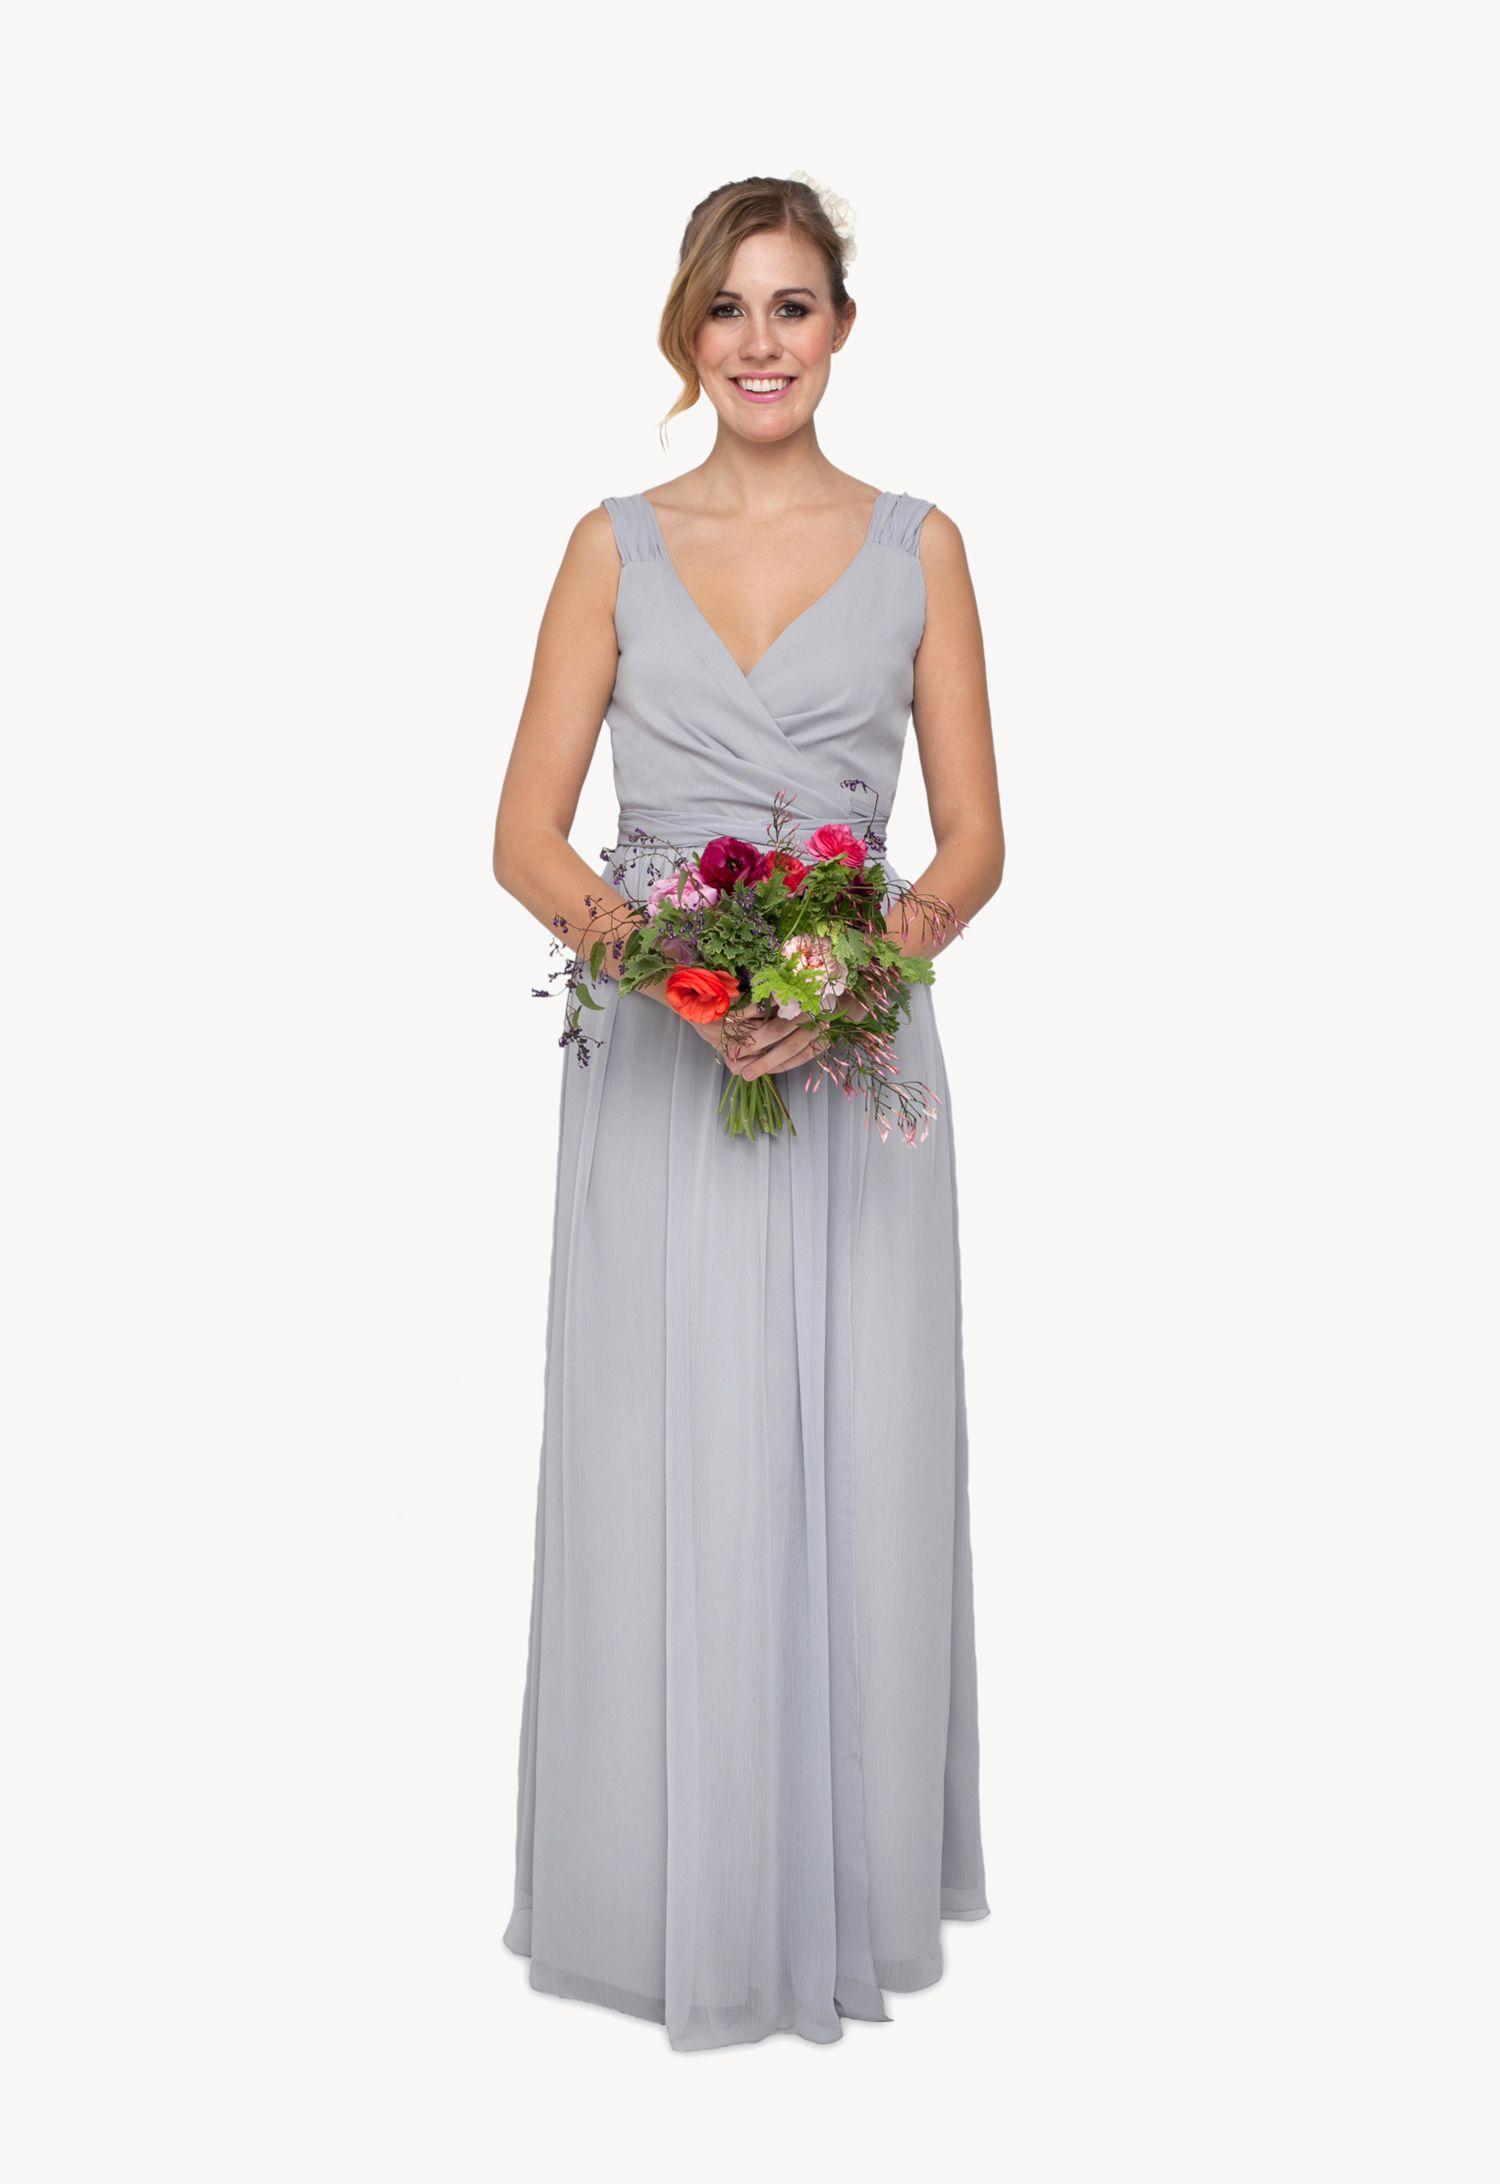 Introducing Littleborroweddress New Bridesmaid Dresses The Classically Chic Madison Dress In Steel RentalHawaii